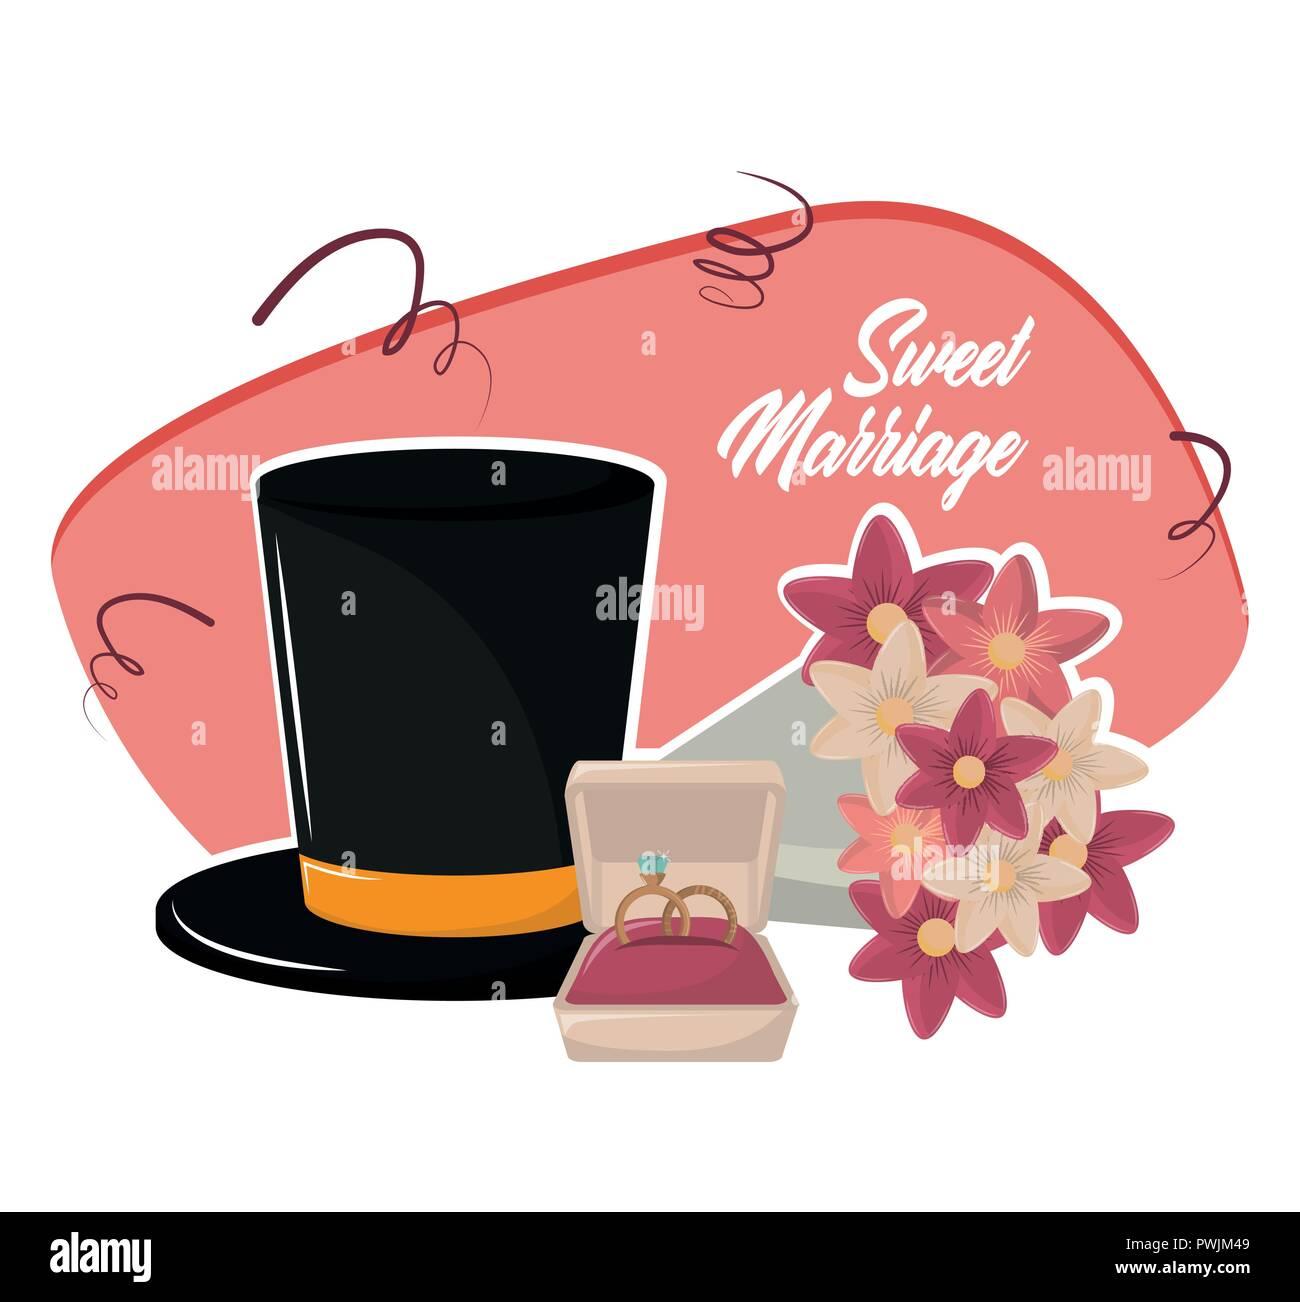 Tarjeta De Invitación De Matrimonio Dulce Cartoon